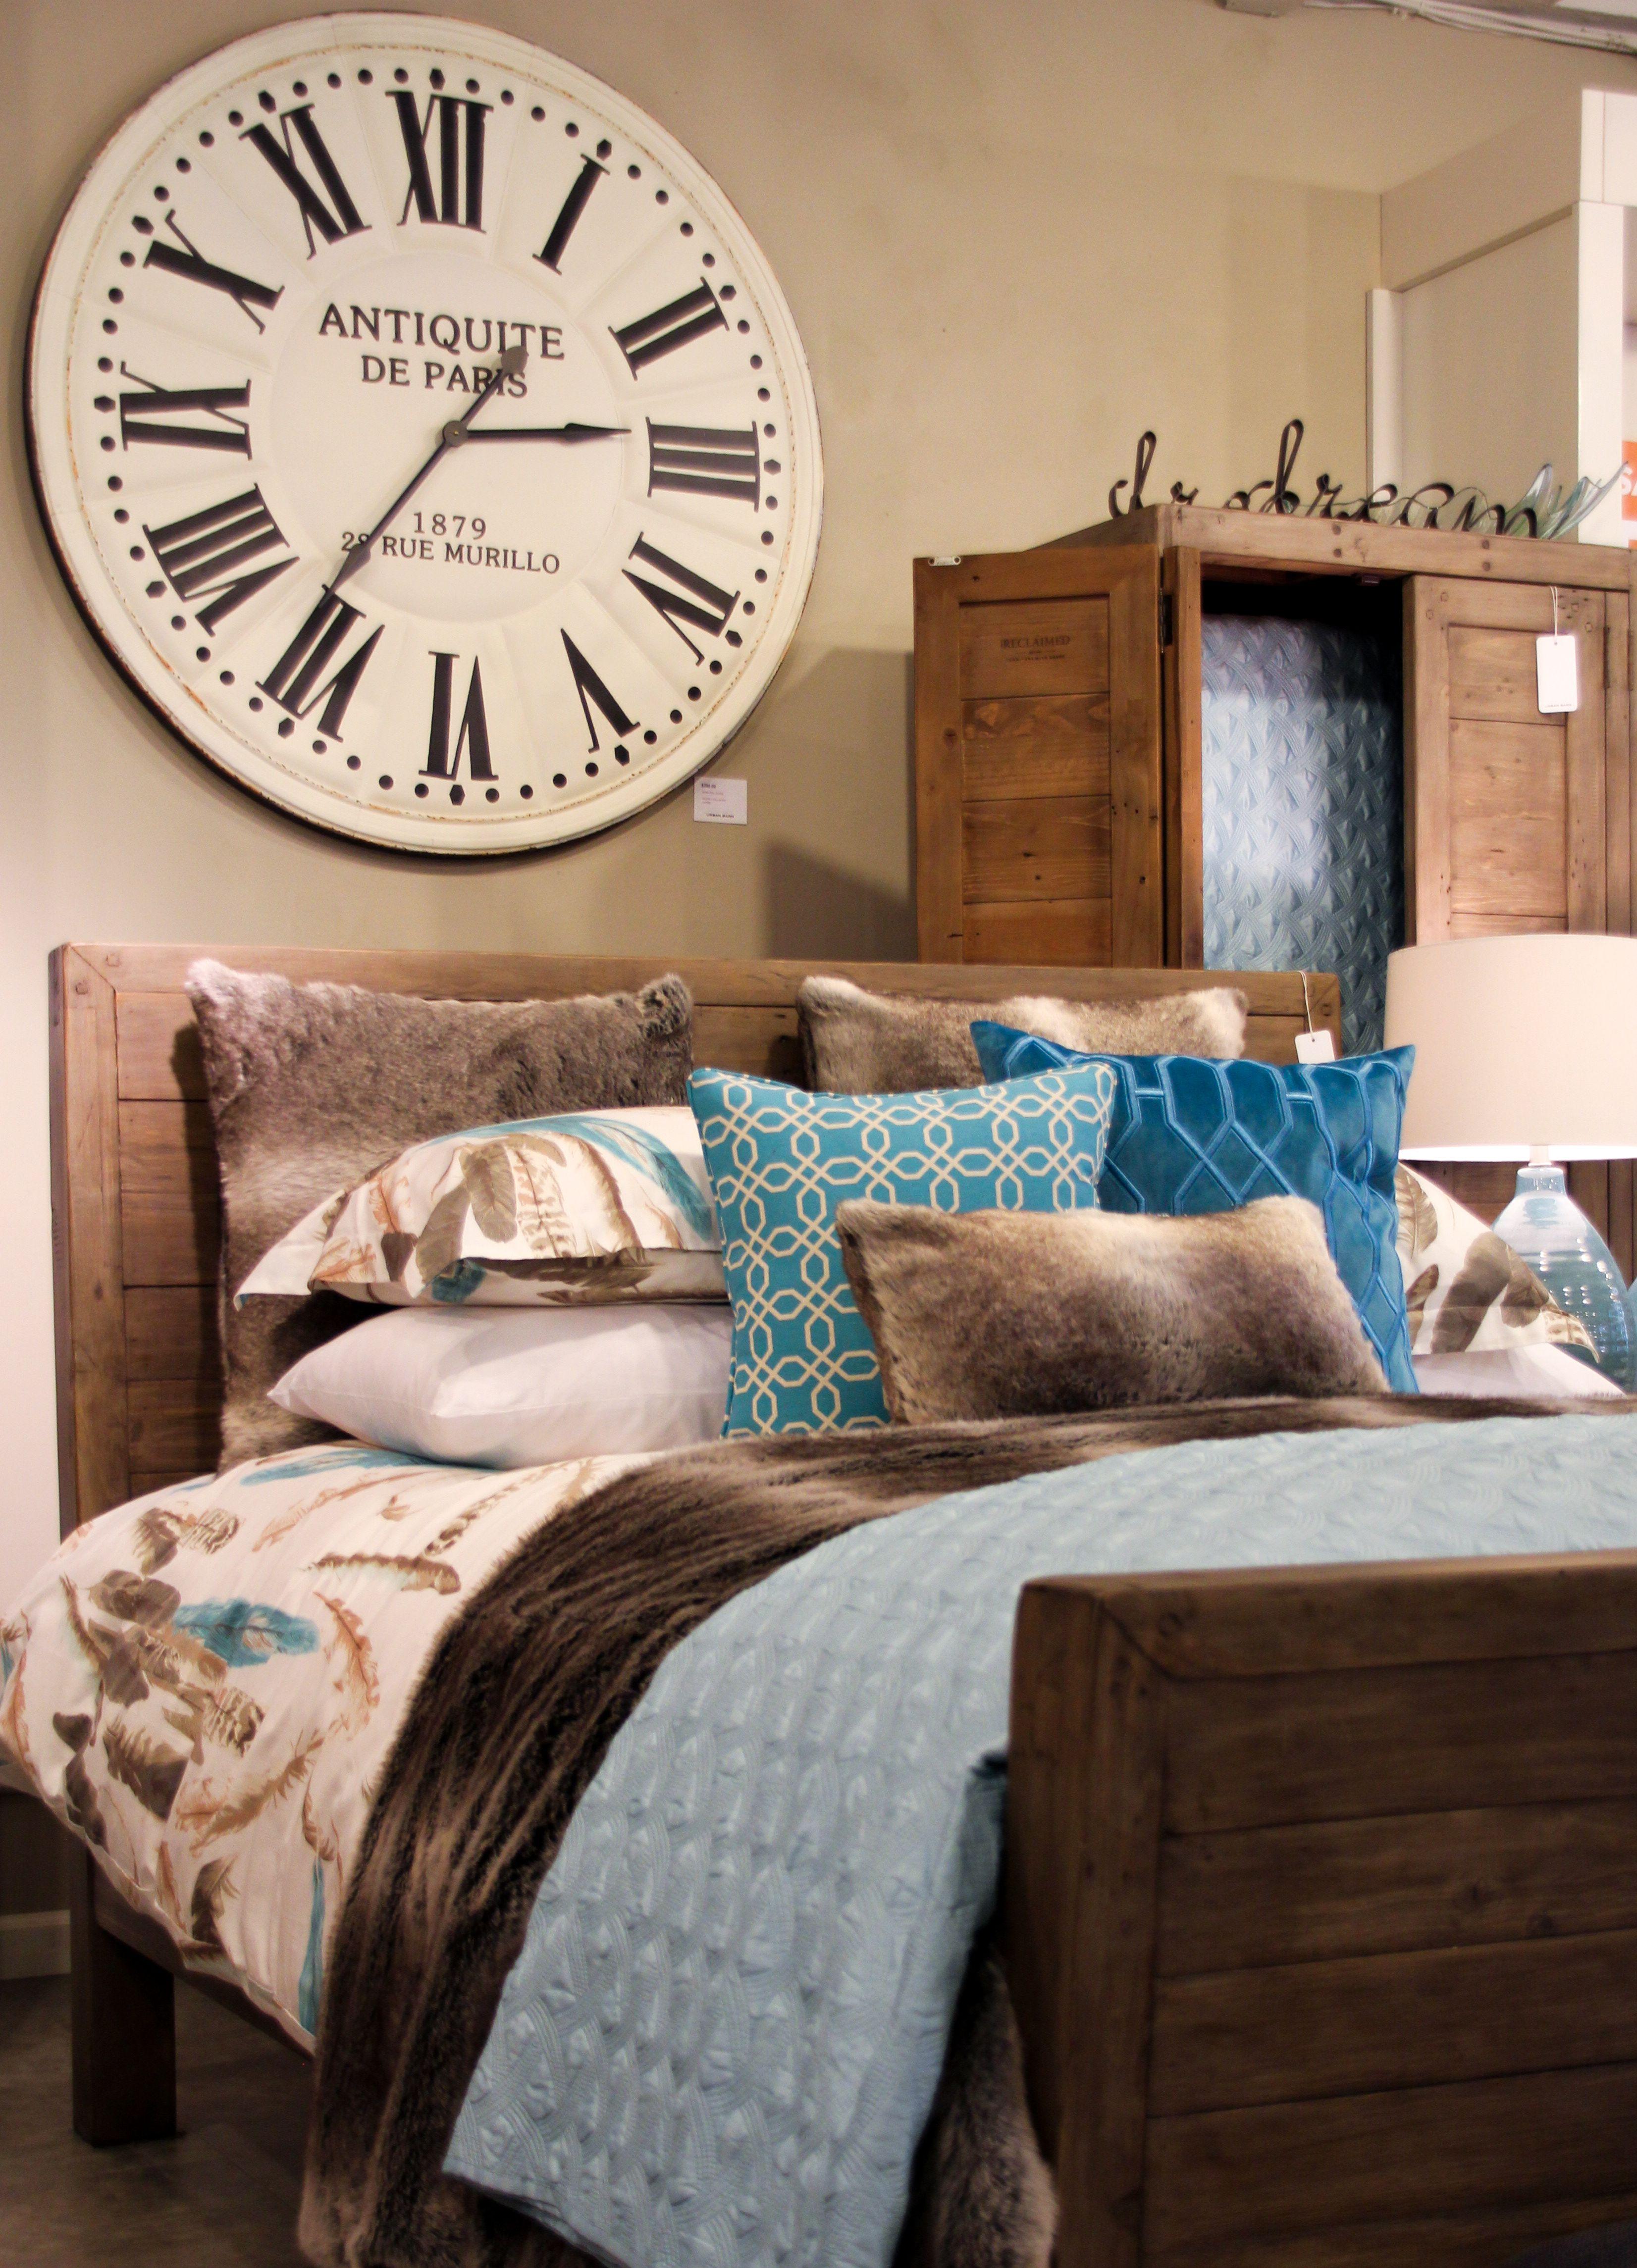 Bedroom Goals Bedroom goals, Bedroom, Urban barn